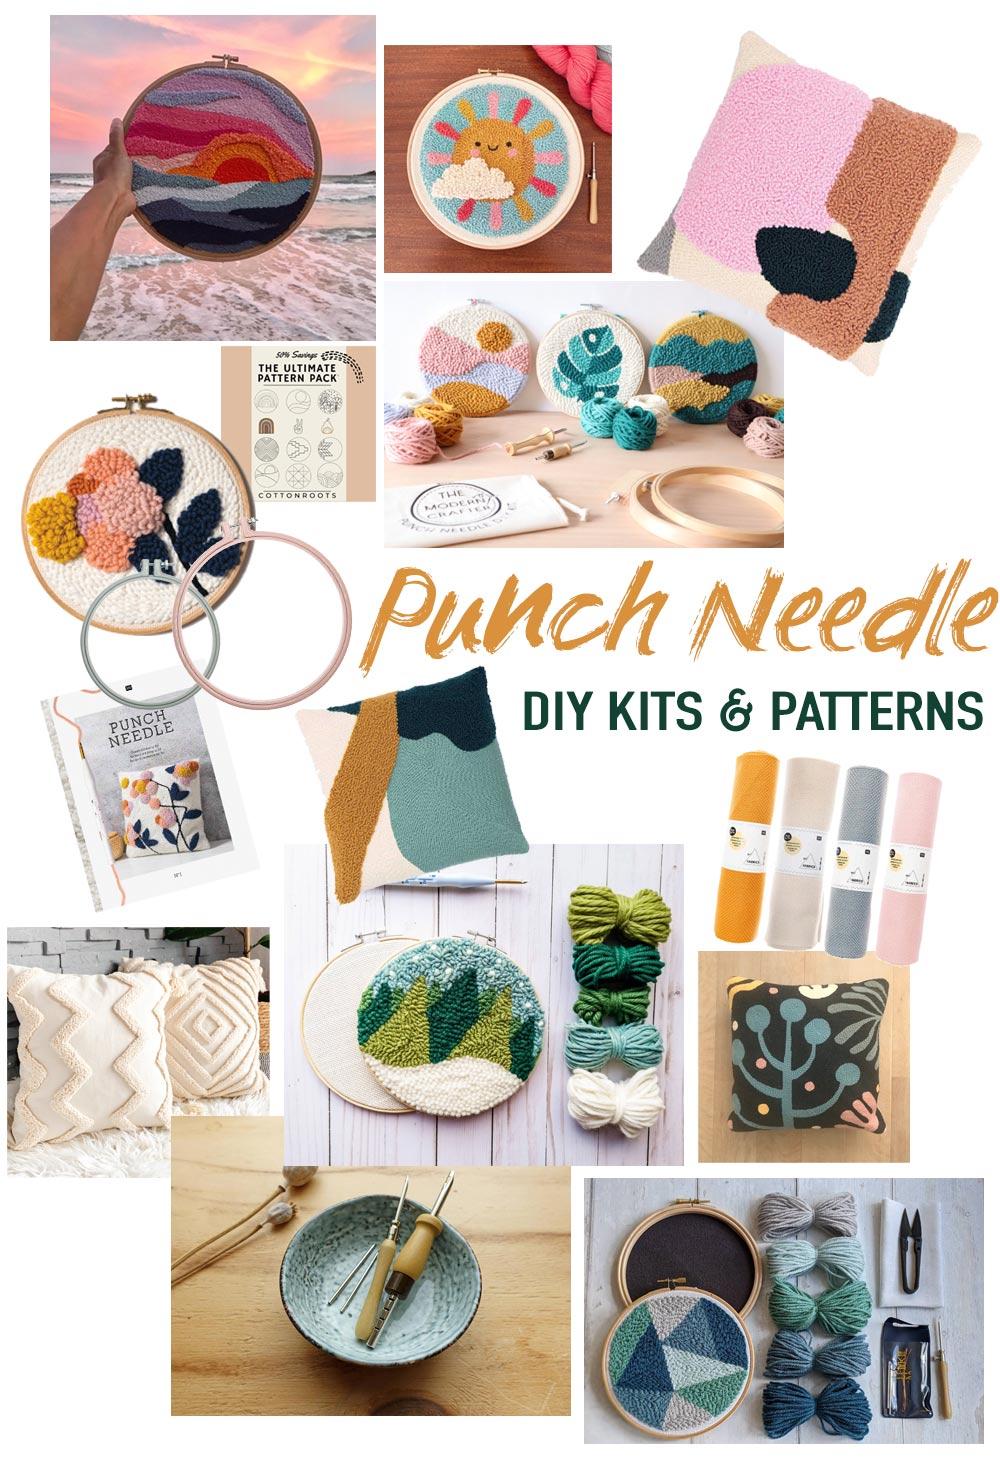 Über 15 moderne Punch Needle DIY Kits und Muster